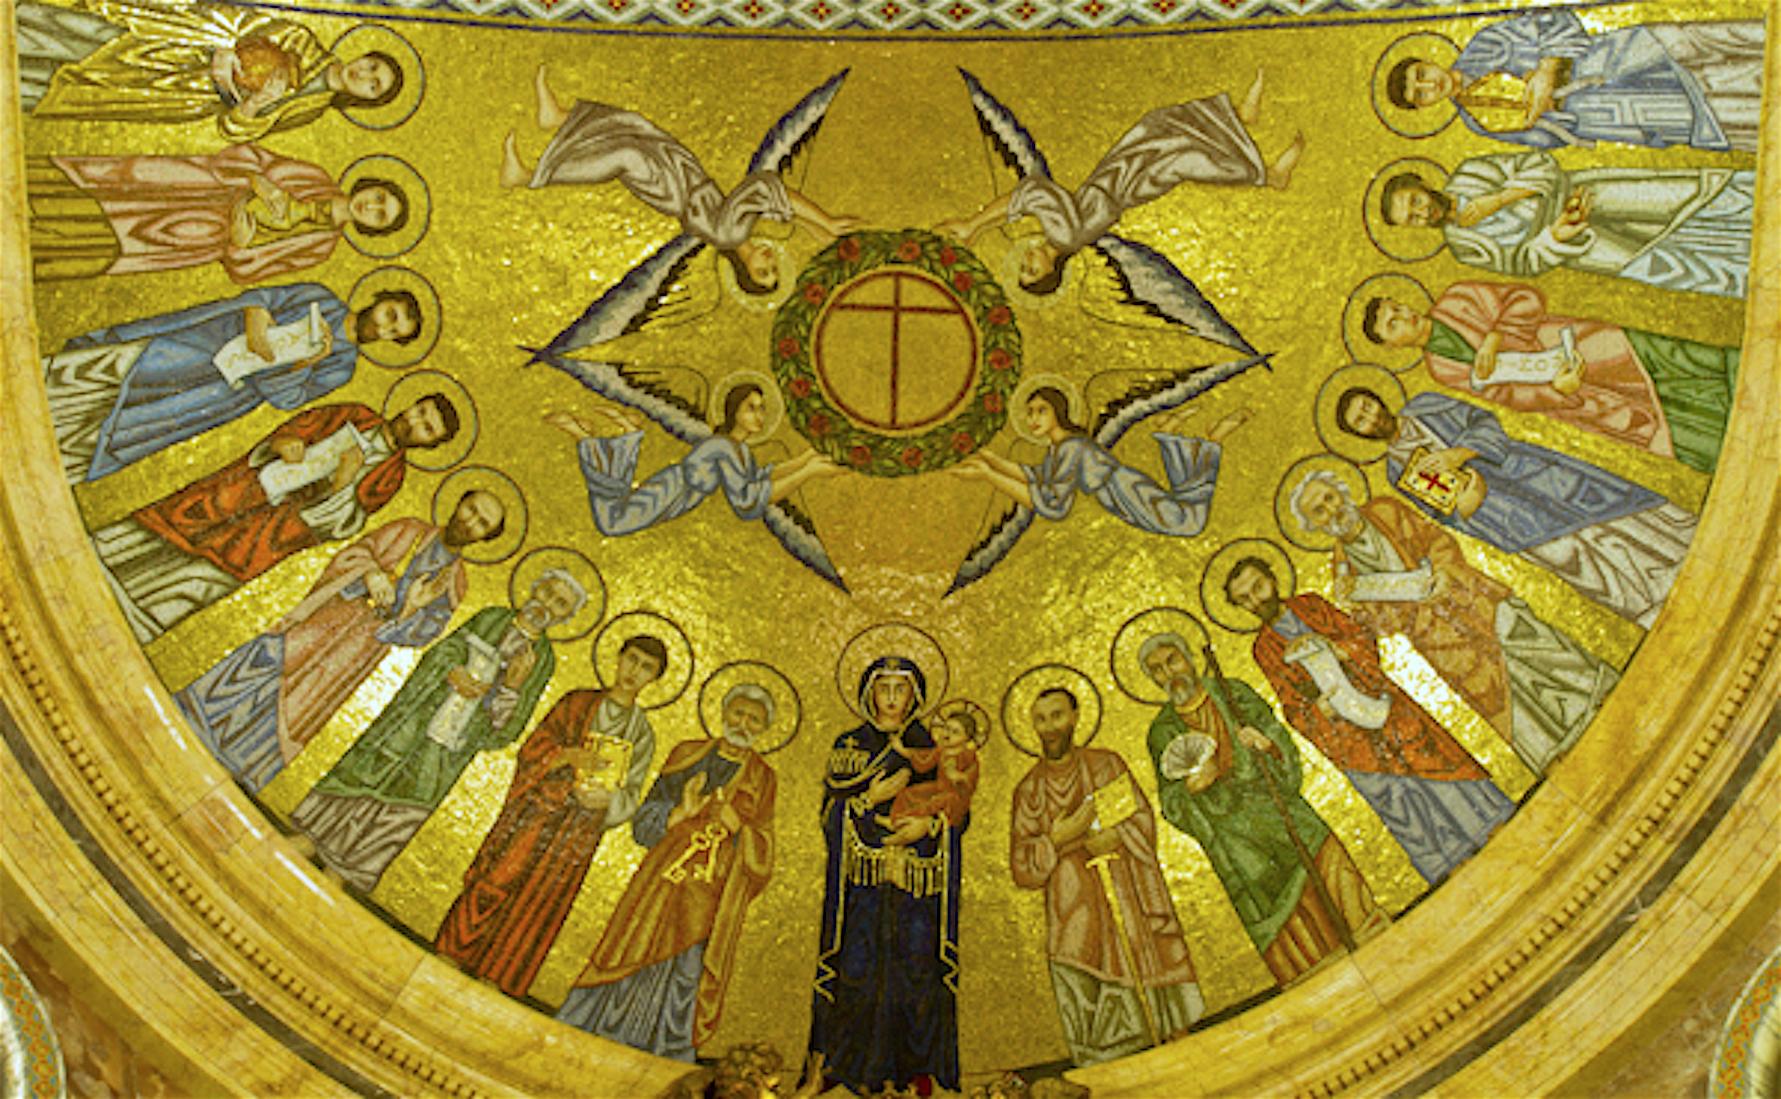 Bóveda de la iglesia prelaticia del Opus Dei en Roma